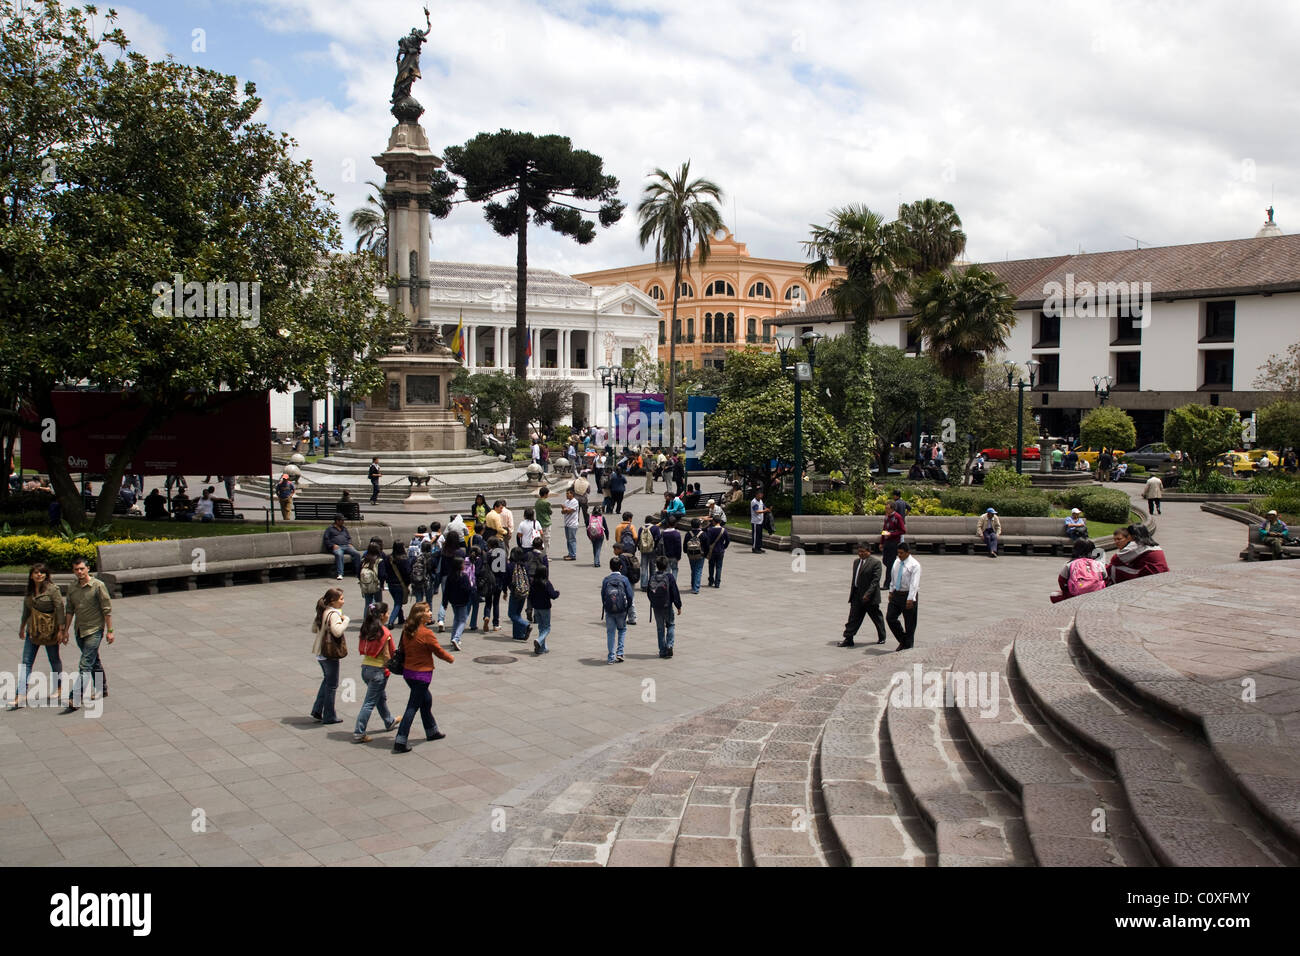 Independence Plaza - Quito, Ecuador - Stock Image